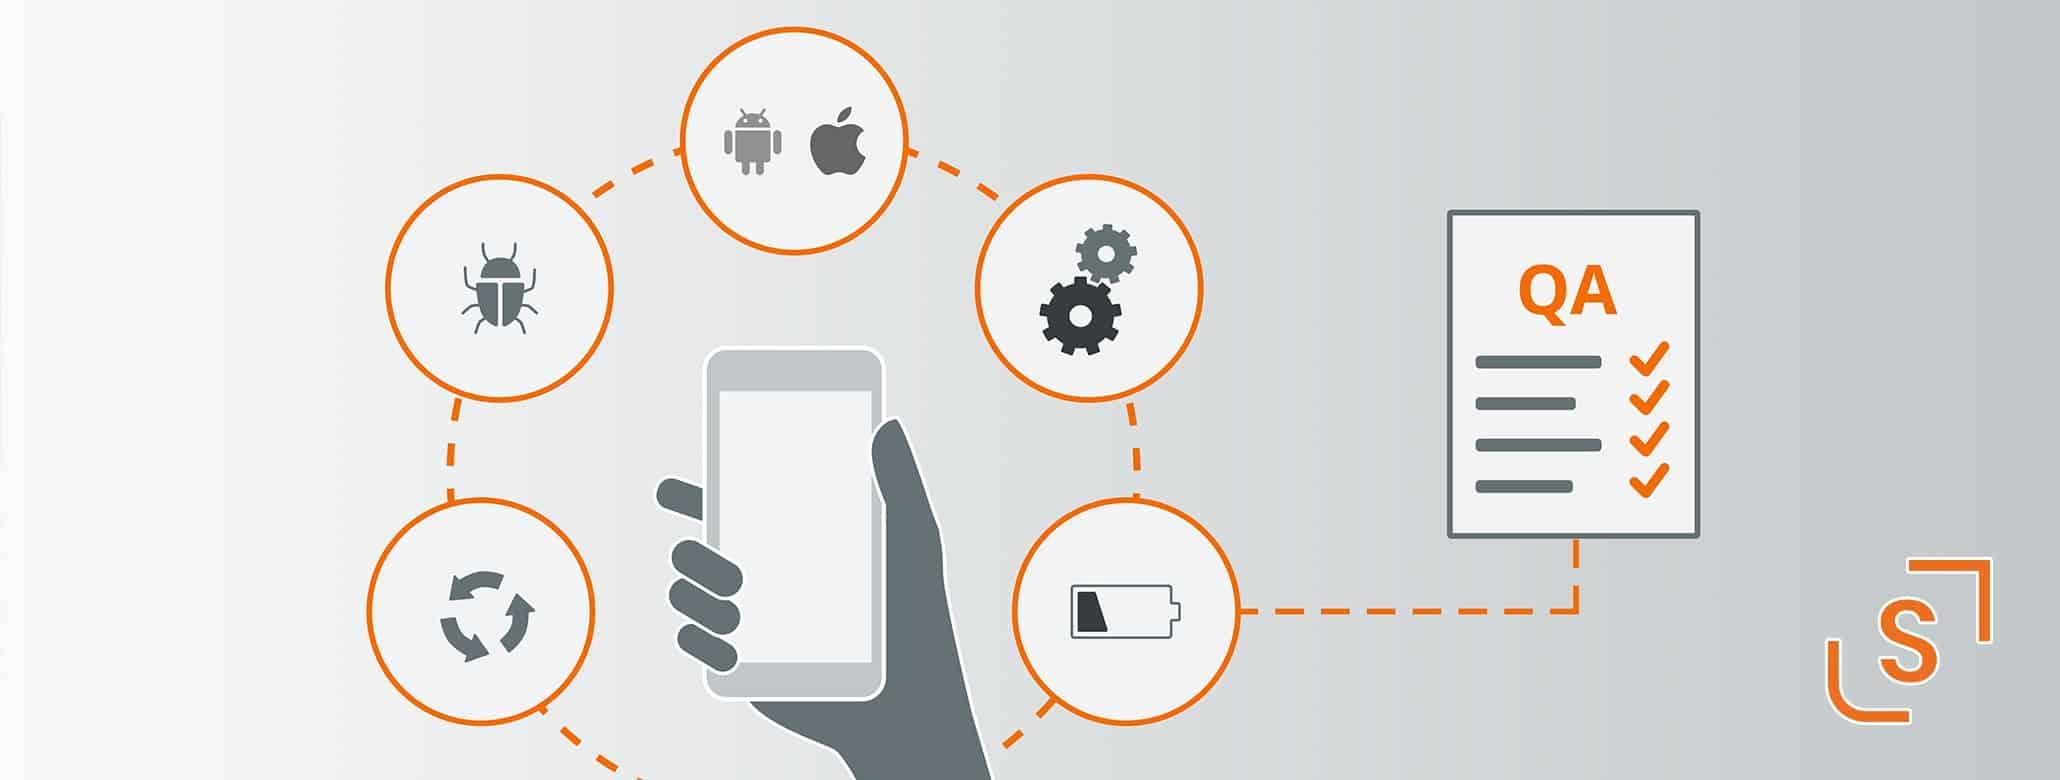 Methods for Mobile App Testing Emulating Real-World Scenarios